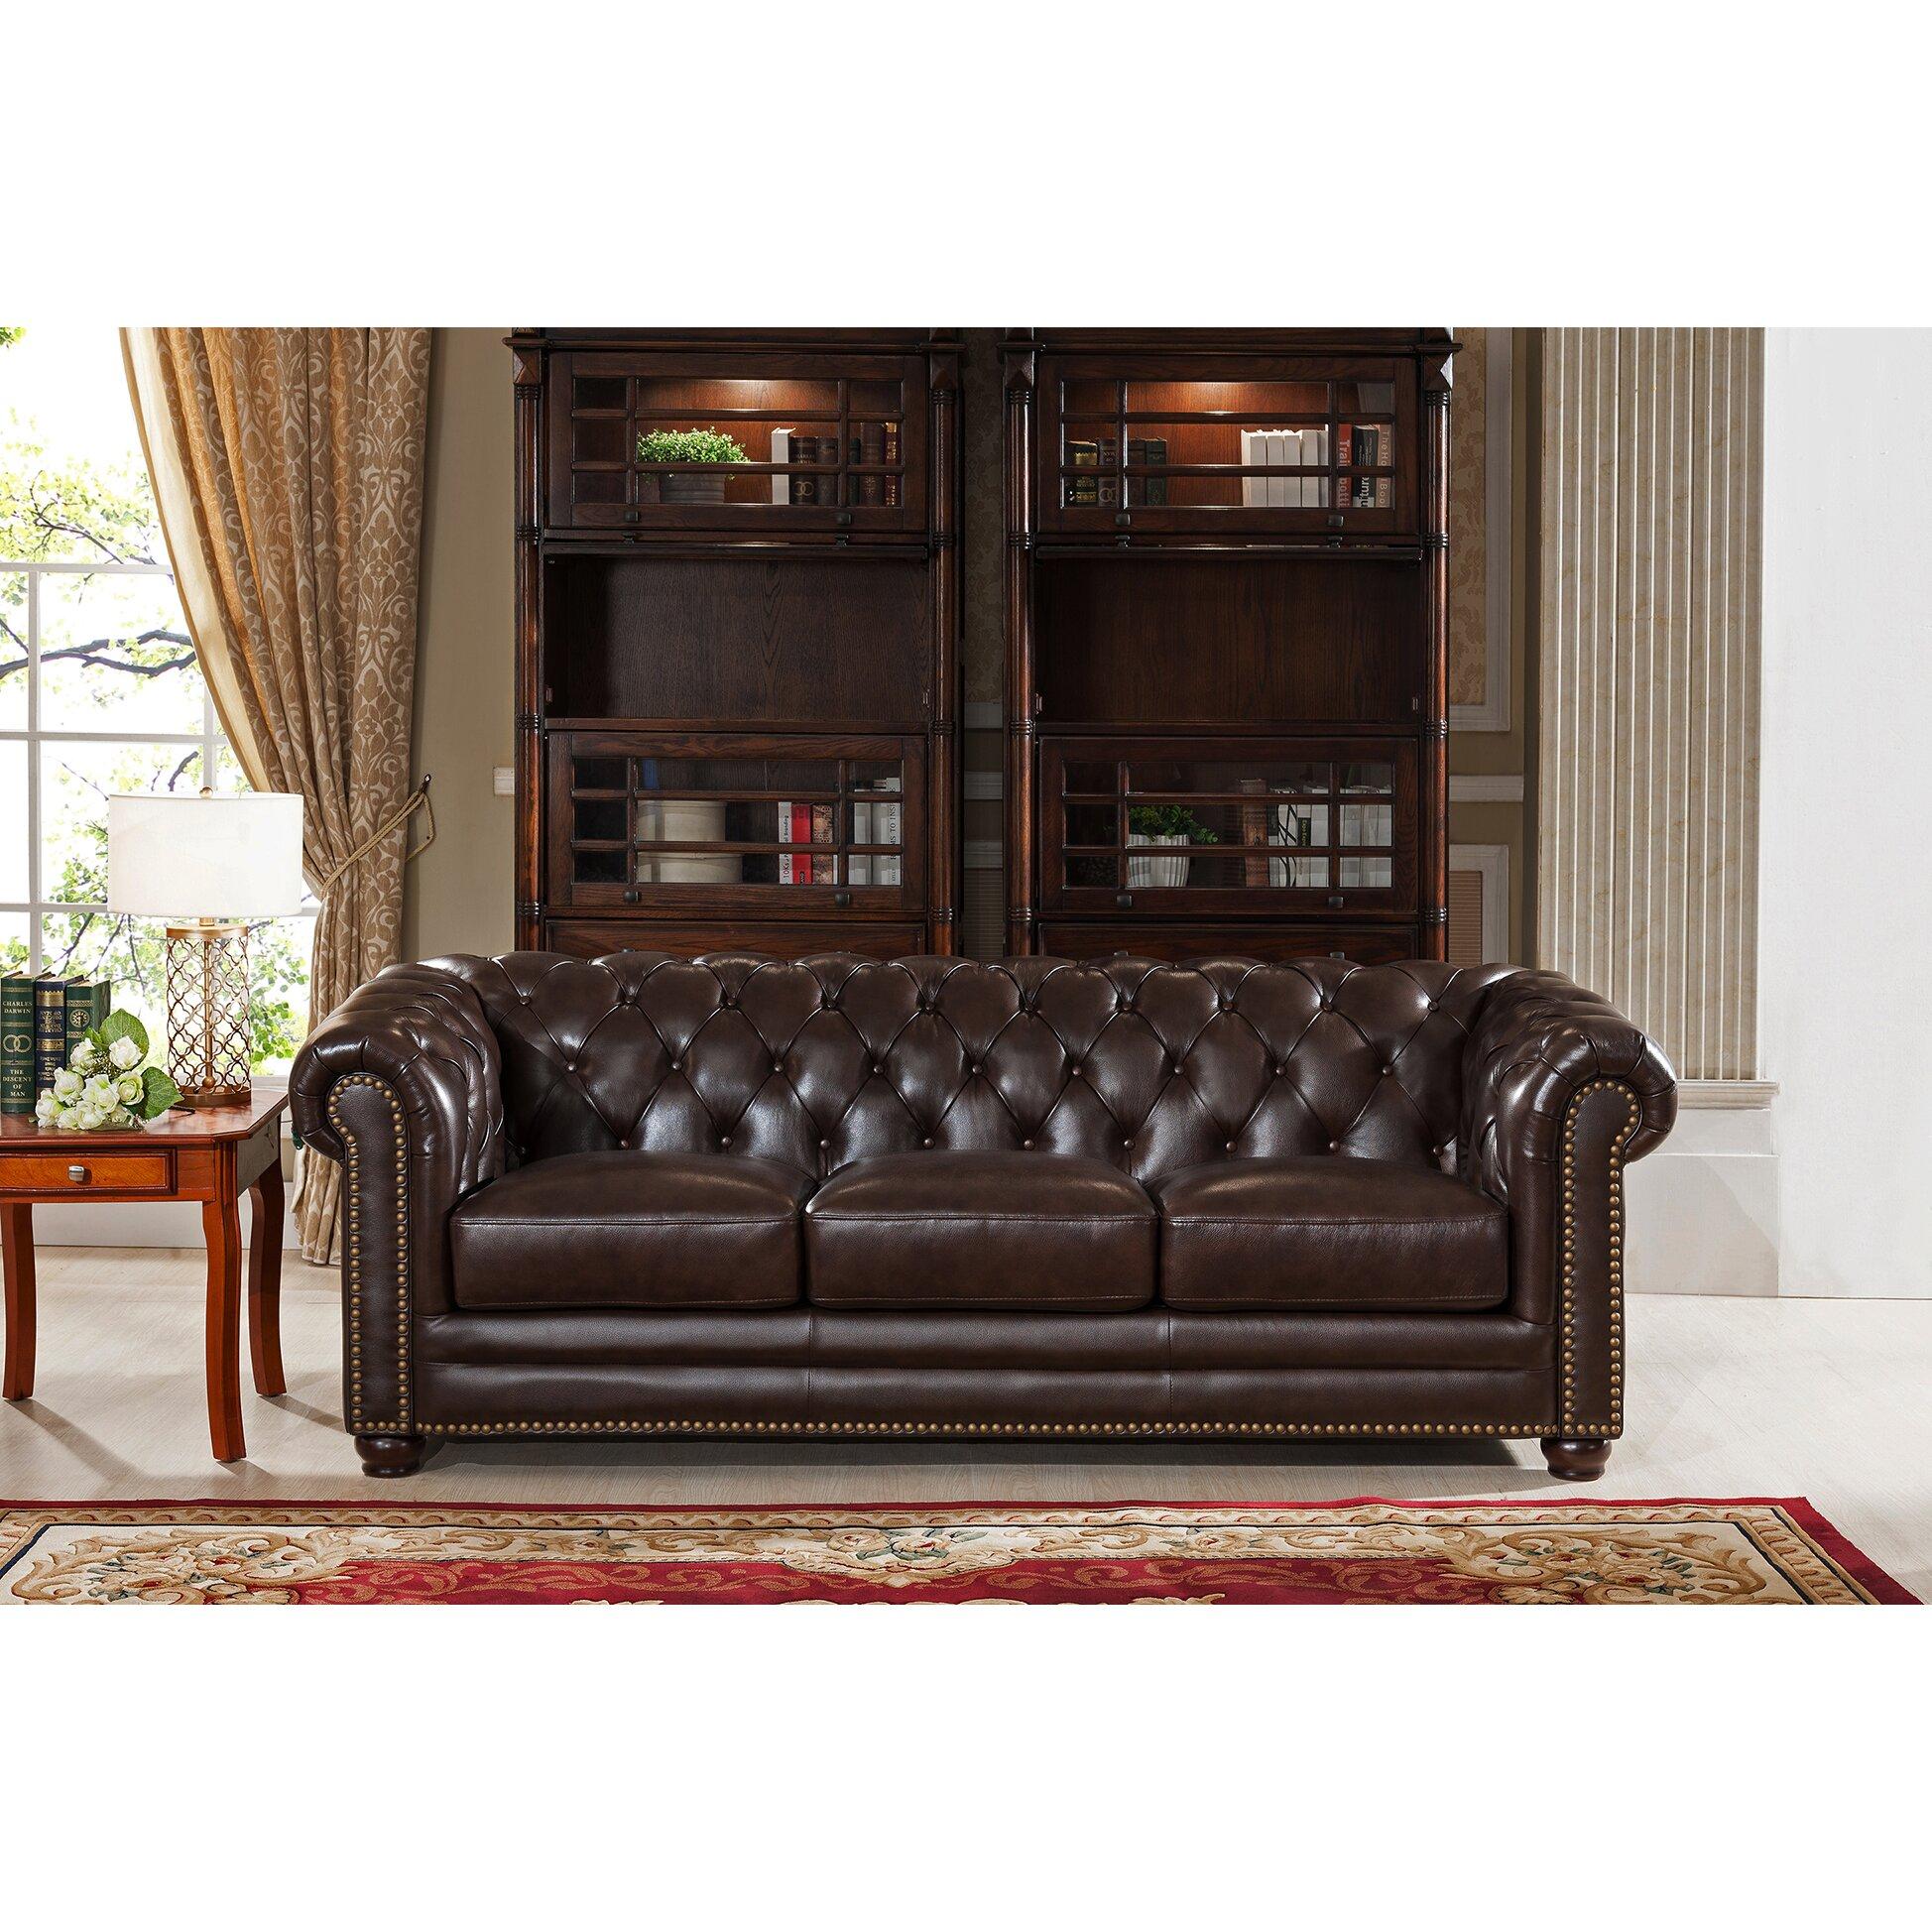 Amax Kensington Top Grain Leather Chesterfield Sofa and Two Chair Set Wayfair ca